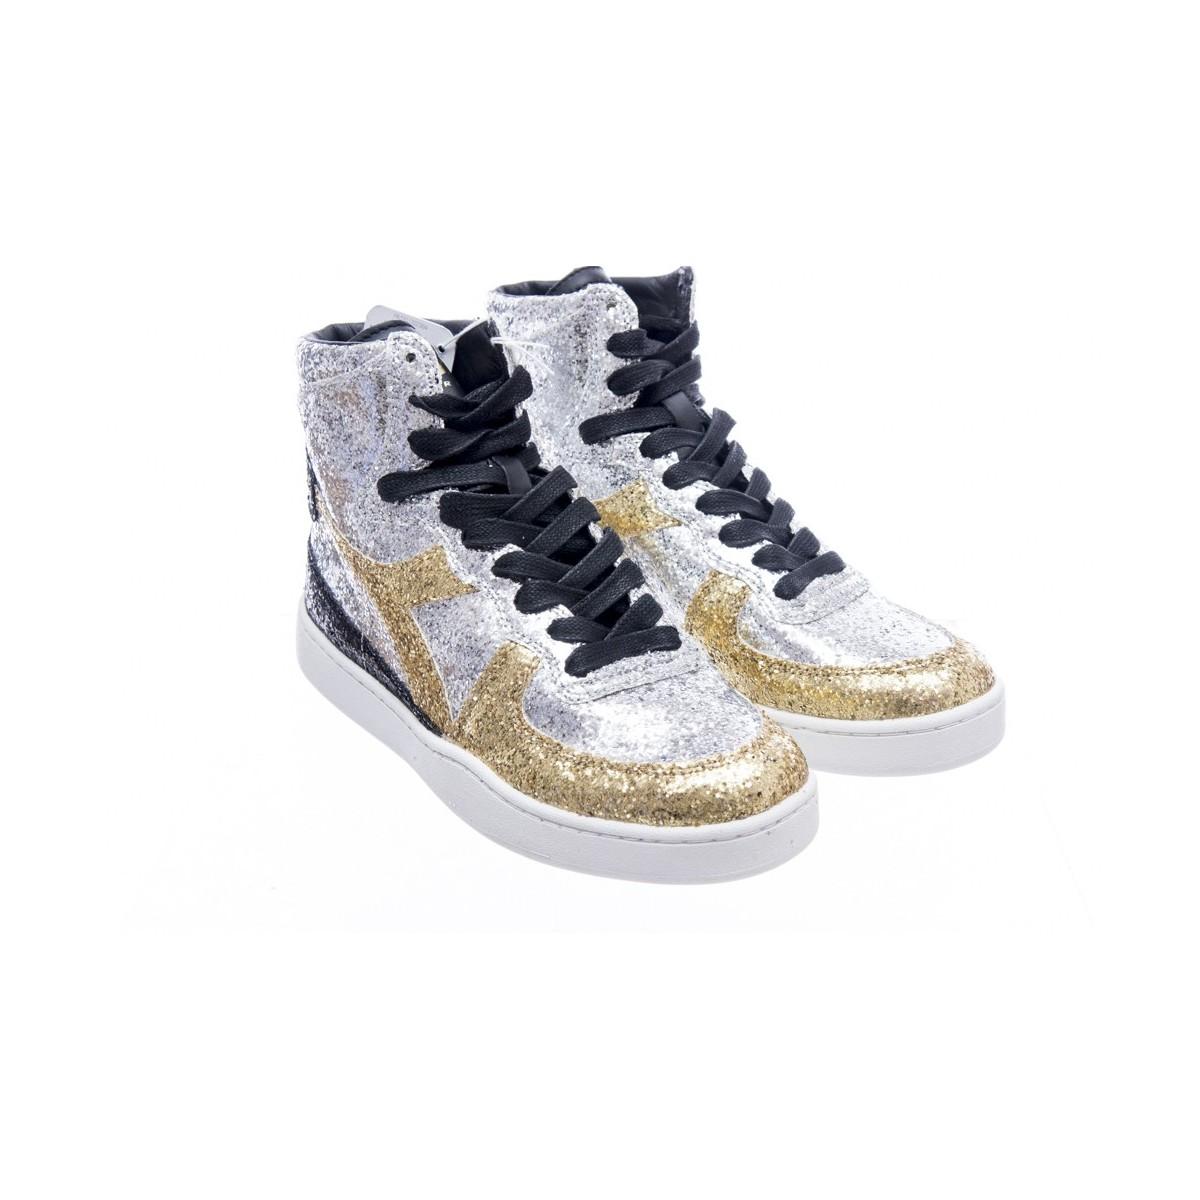 Scarpa Diadora - Mi basket glitter 201.171394